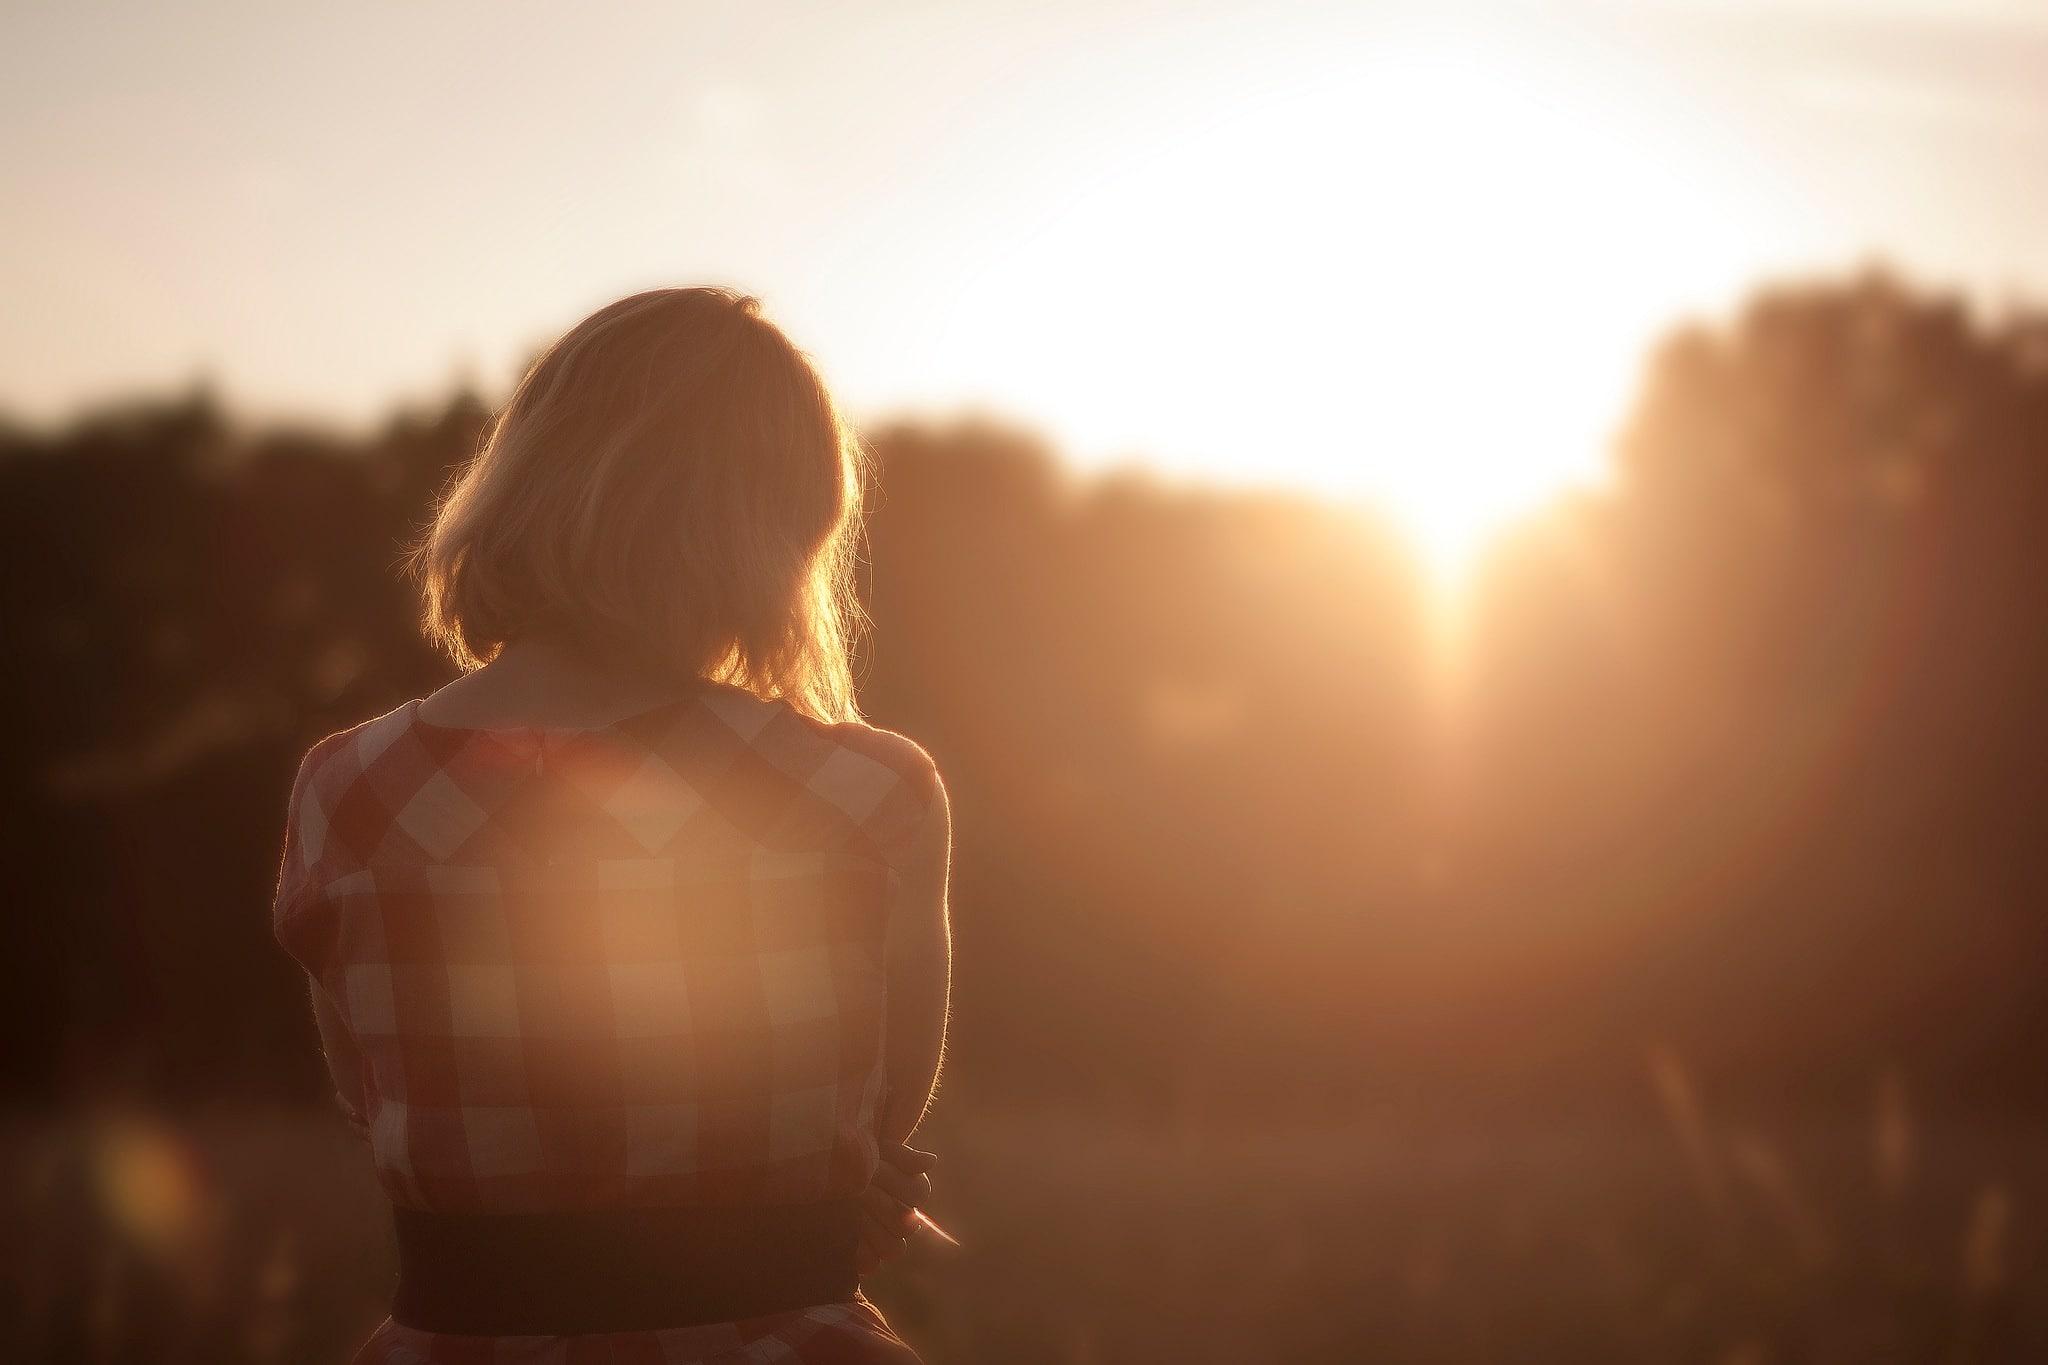 neurofeedback helped with my anxiety